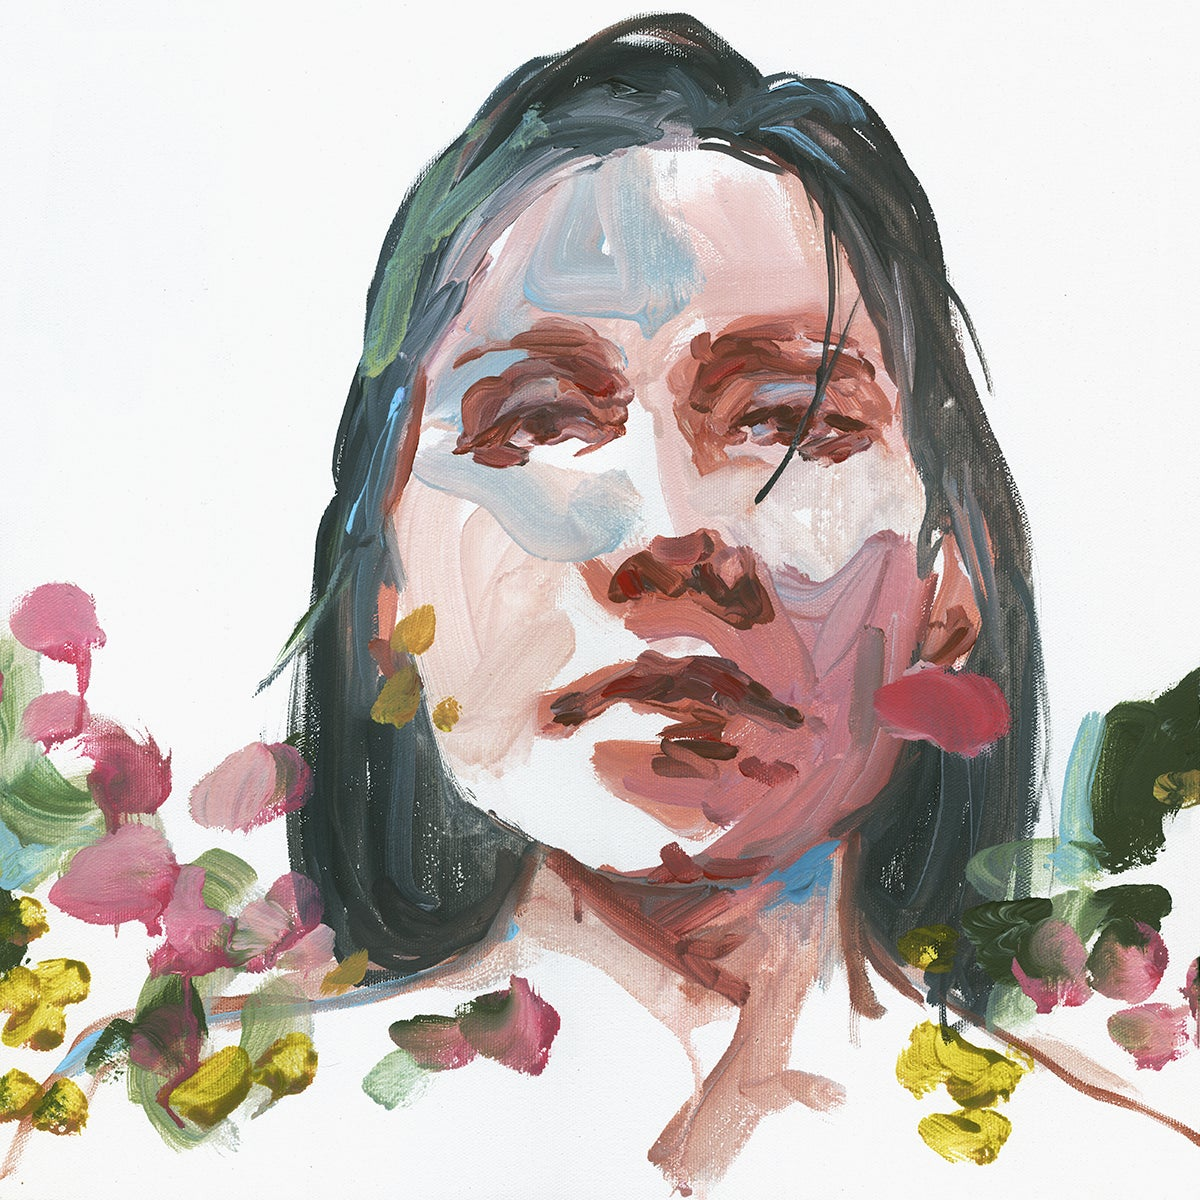 Agnes-Cecile study 05